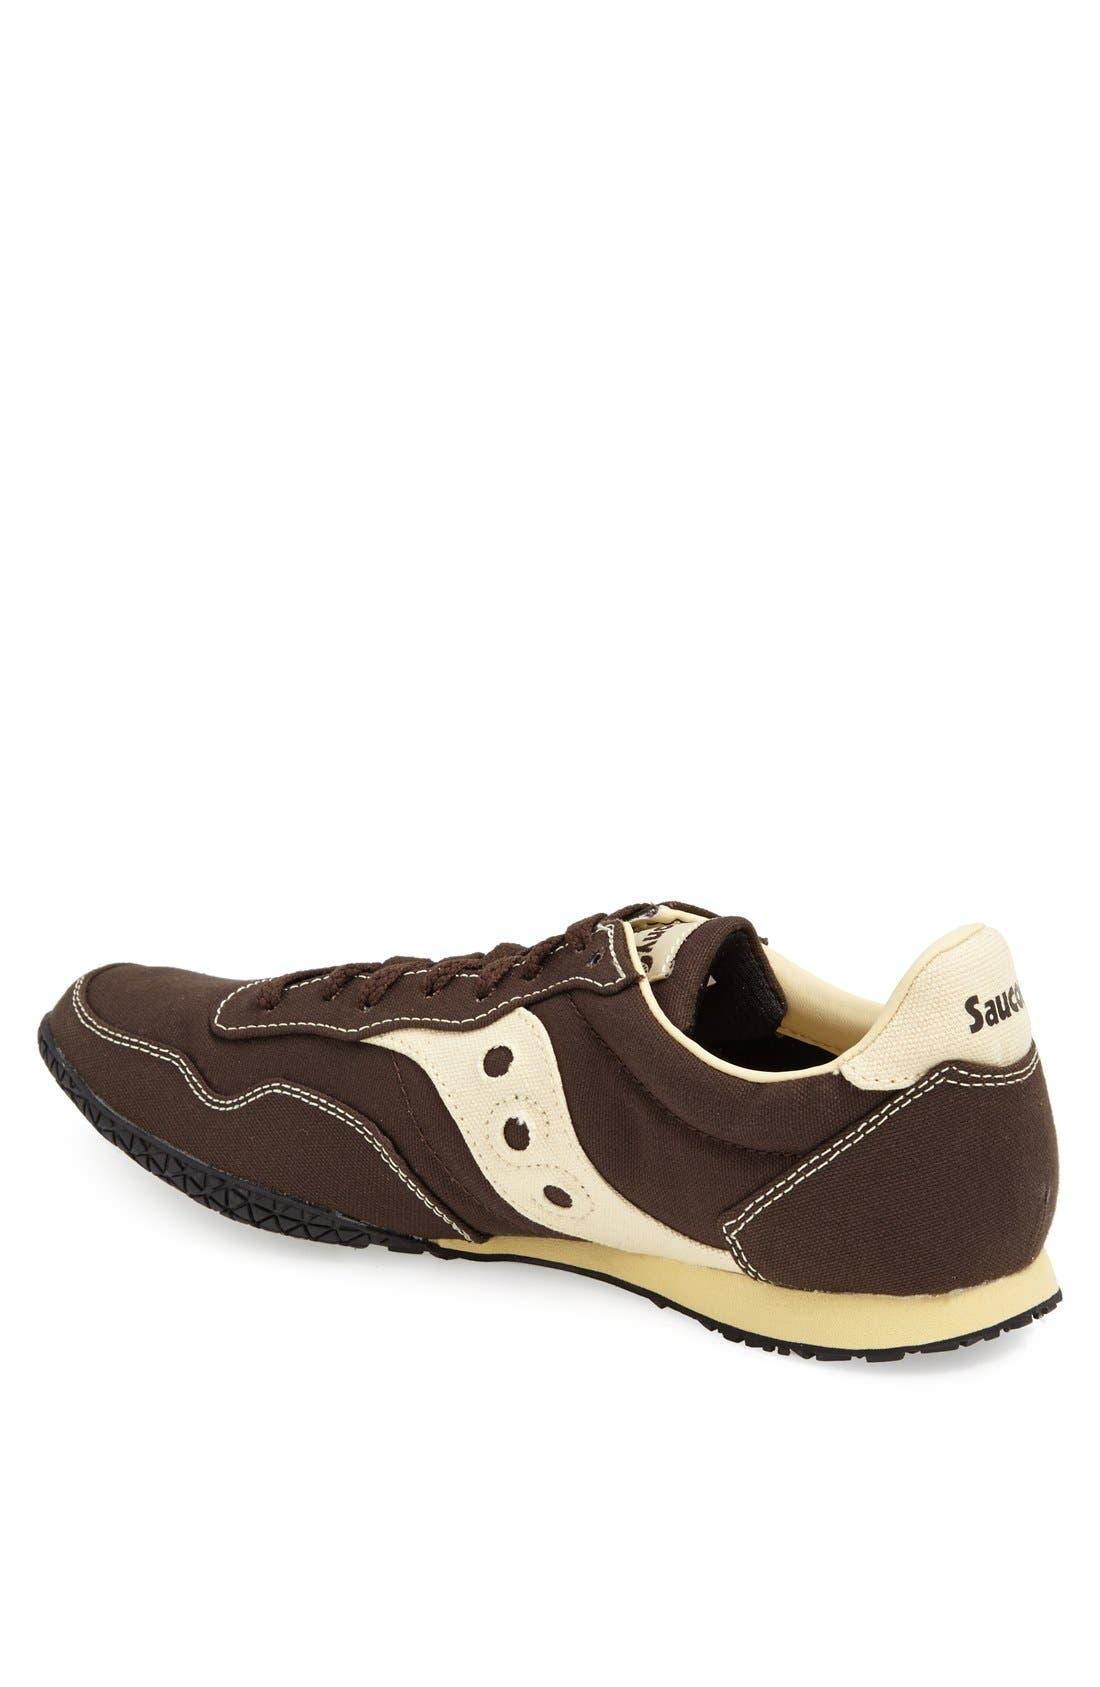 Alternate Image 2  - Saucony 'Bullet Vegan' Sneaker (Men)